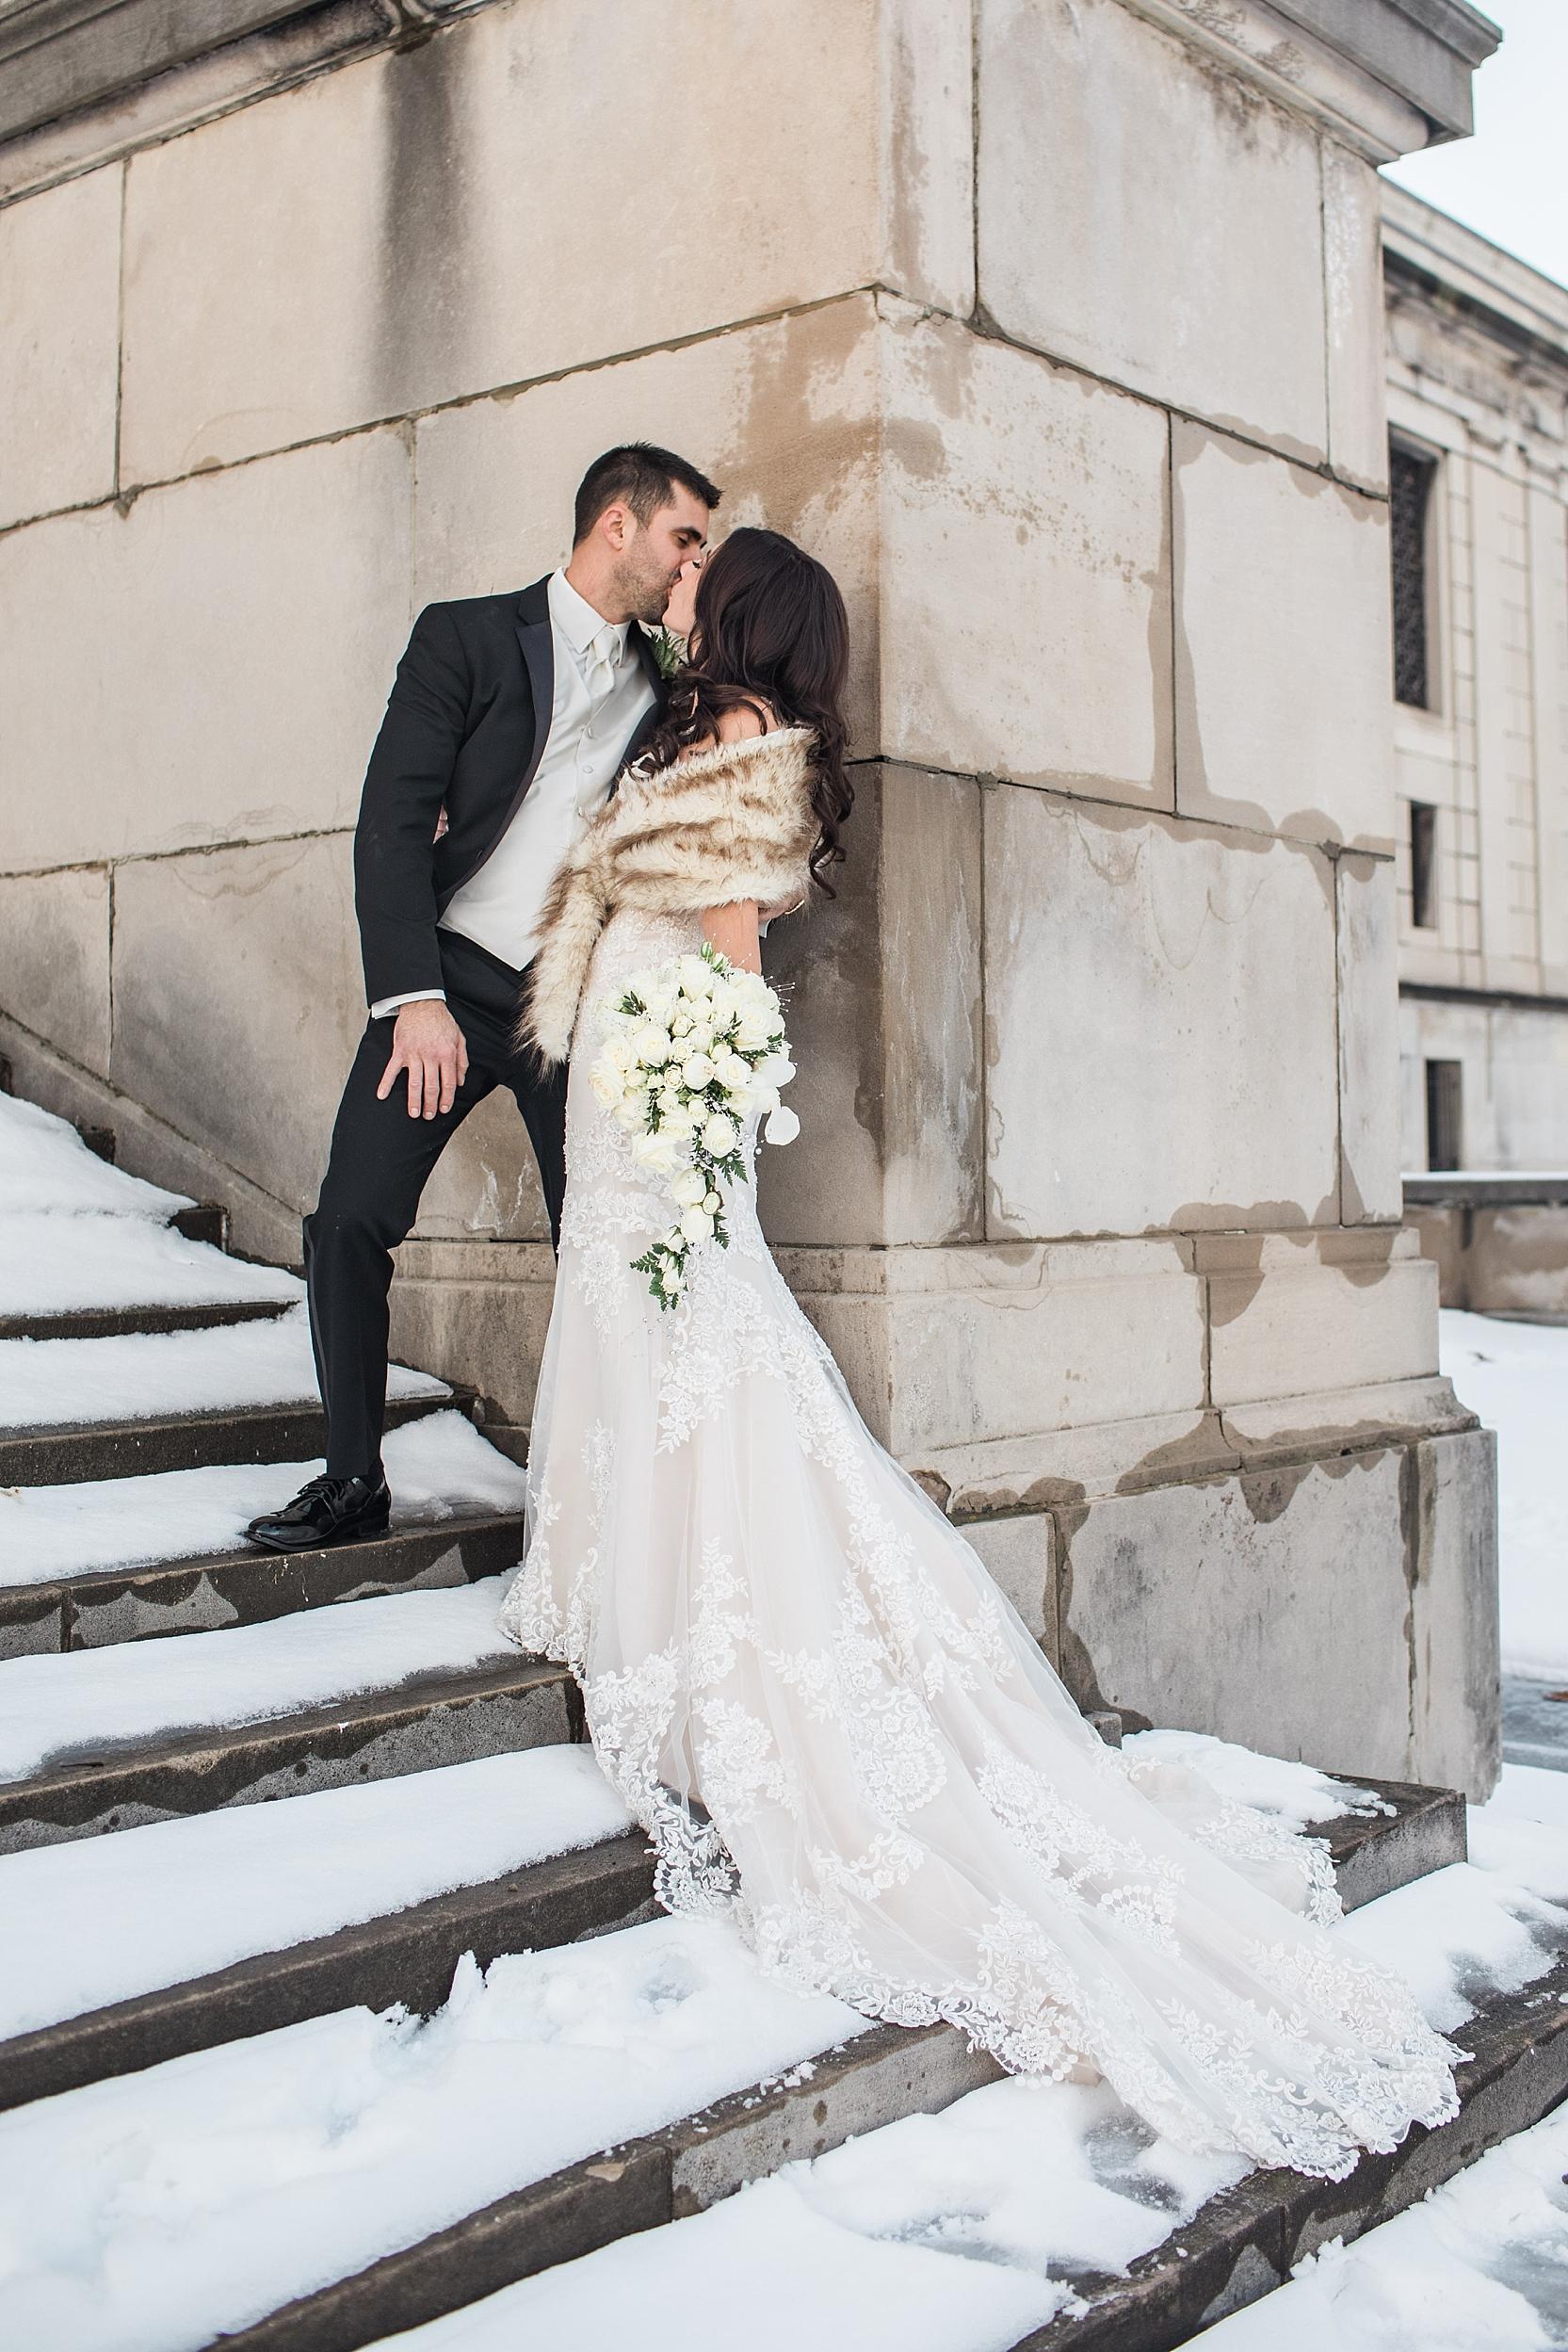 Youngstown Ohio Winter Wedding at Stambaugh Auditorium